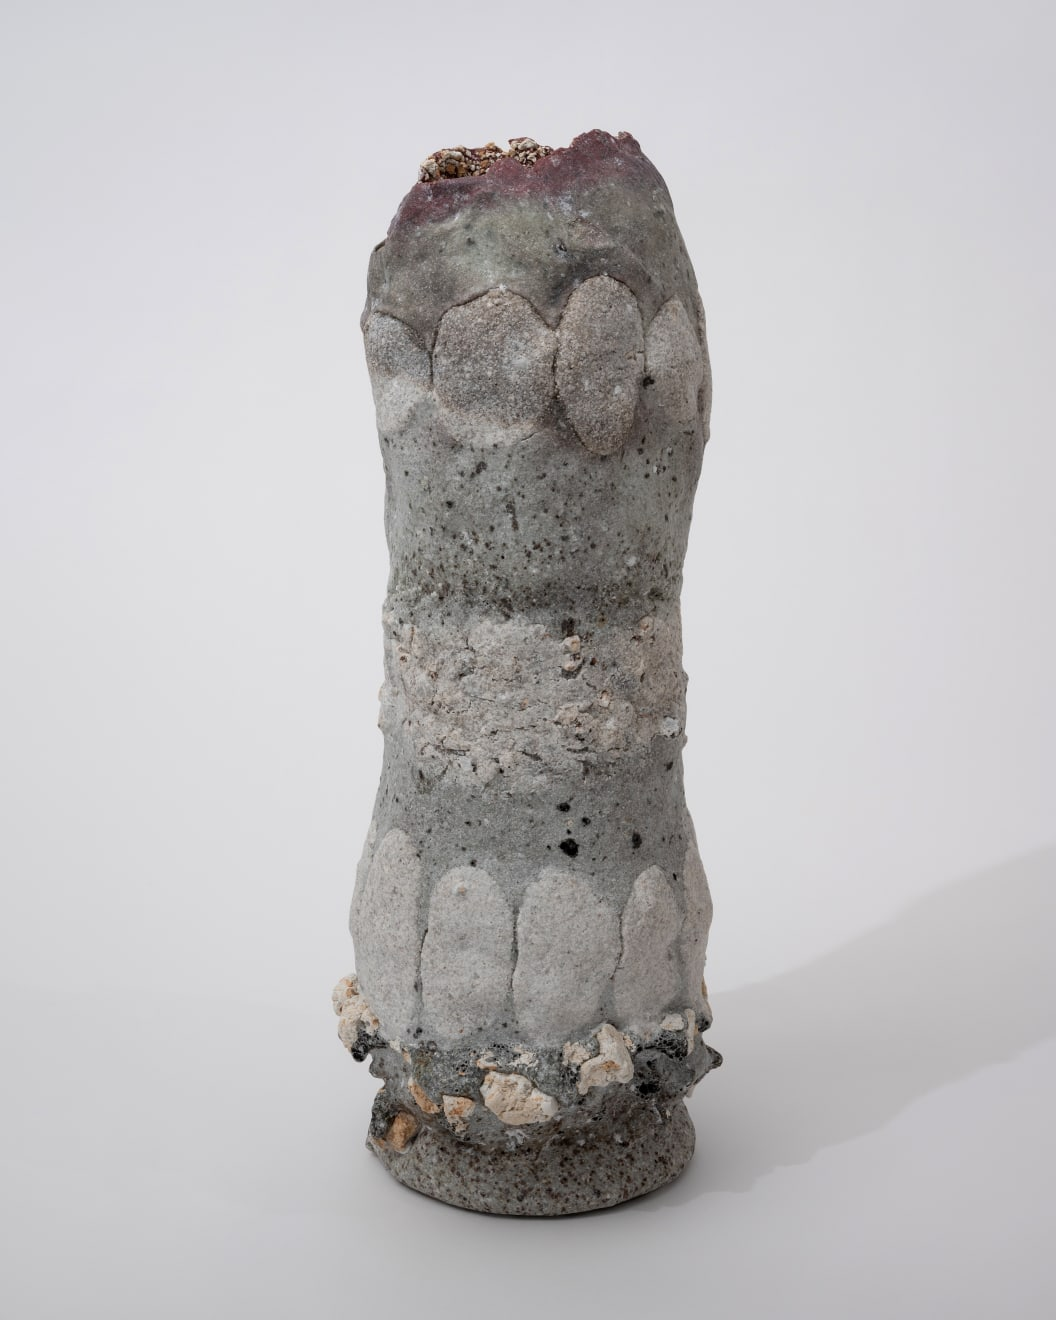 Masaomi Yasunaga, 熔ける器 / melting vessel, 2019